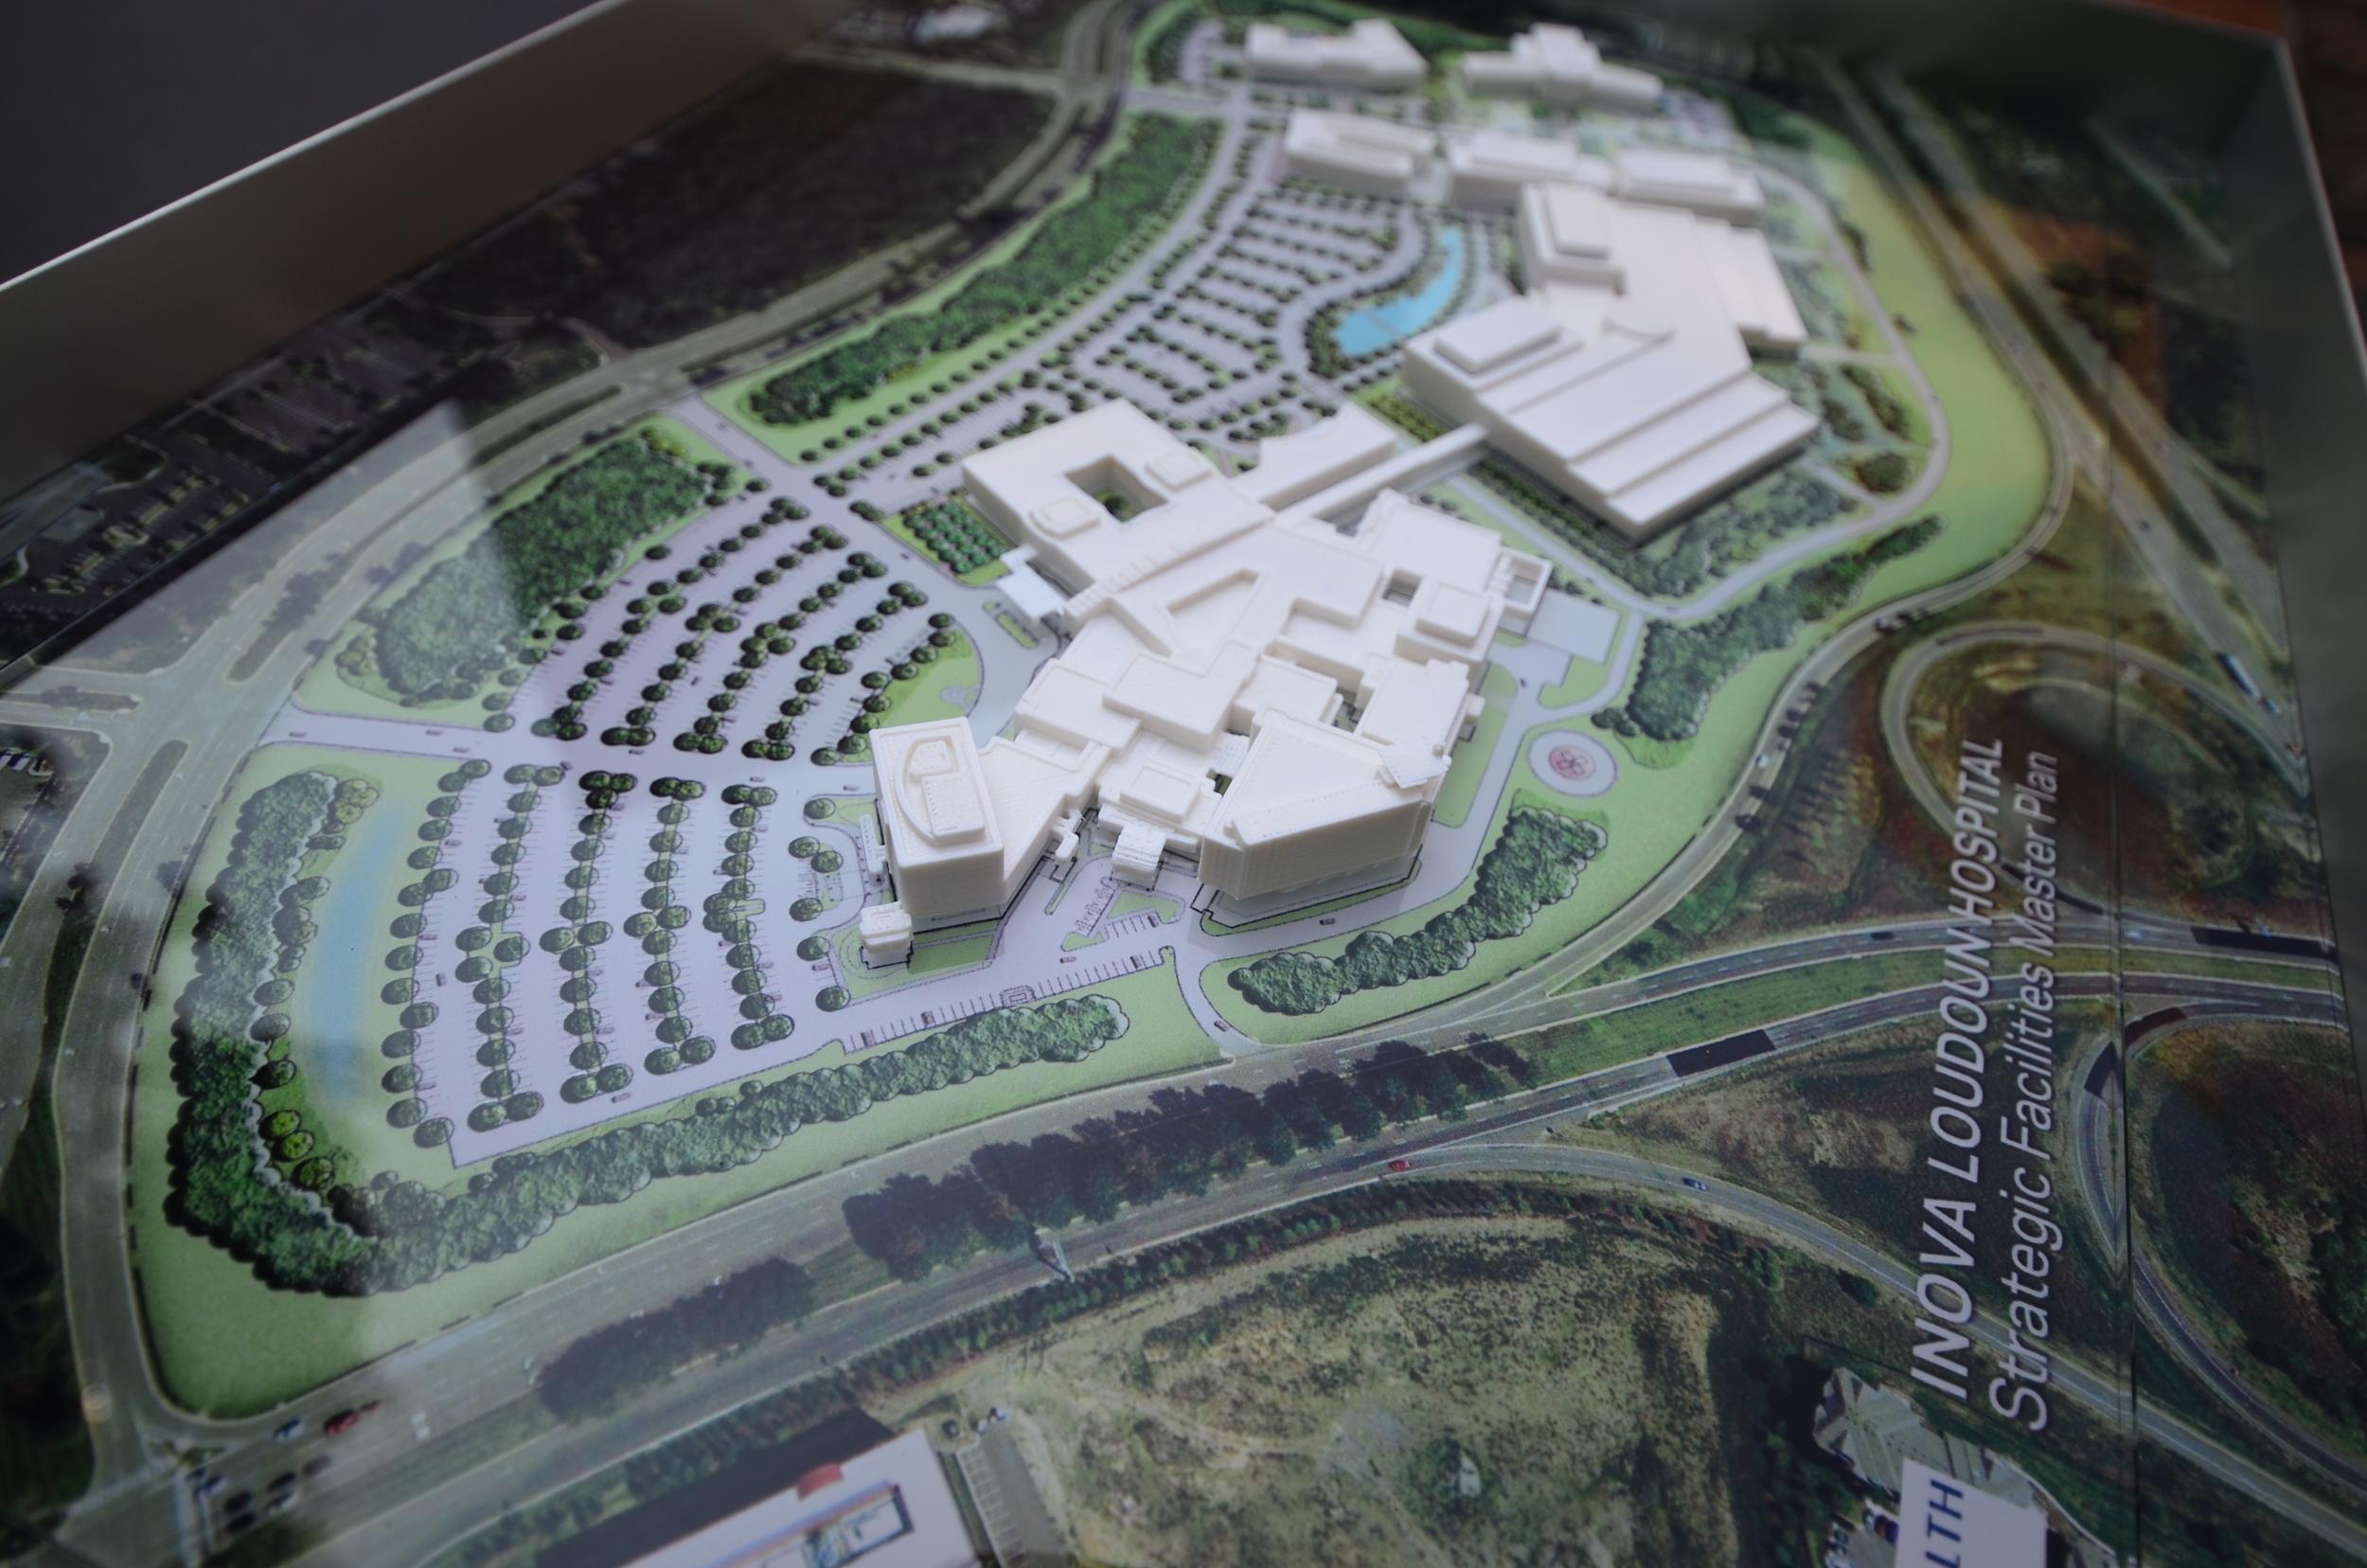 HOSPITAL GIVE AWAY  Loudon, VA | Image courtesy of HOK DC